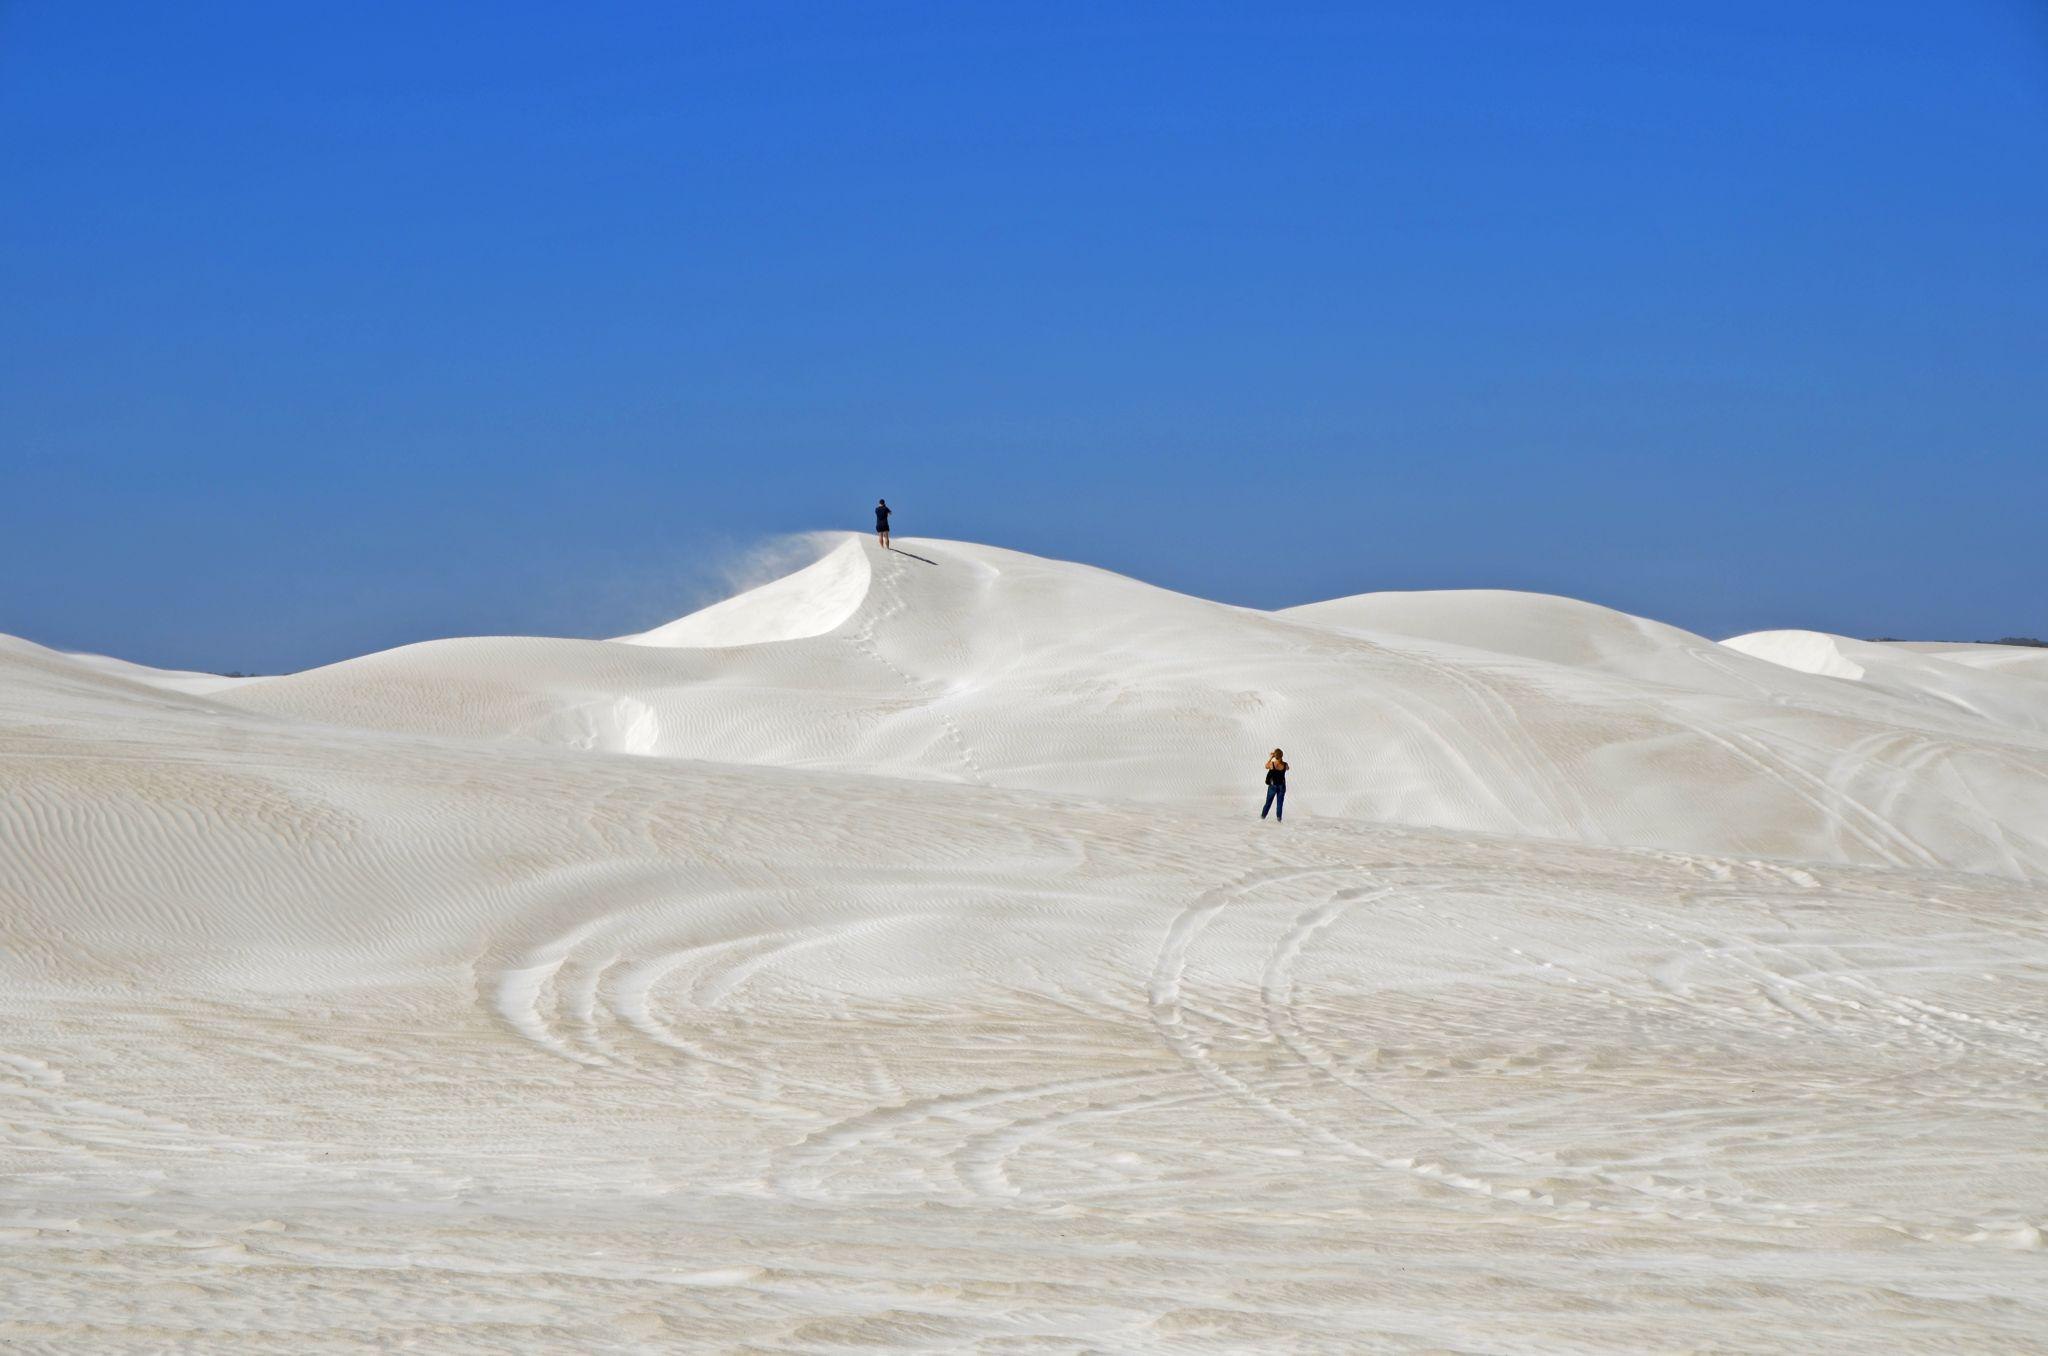 sand dunes, Australia